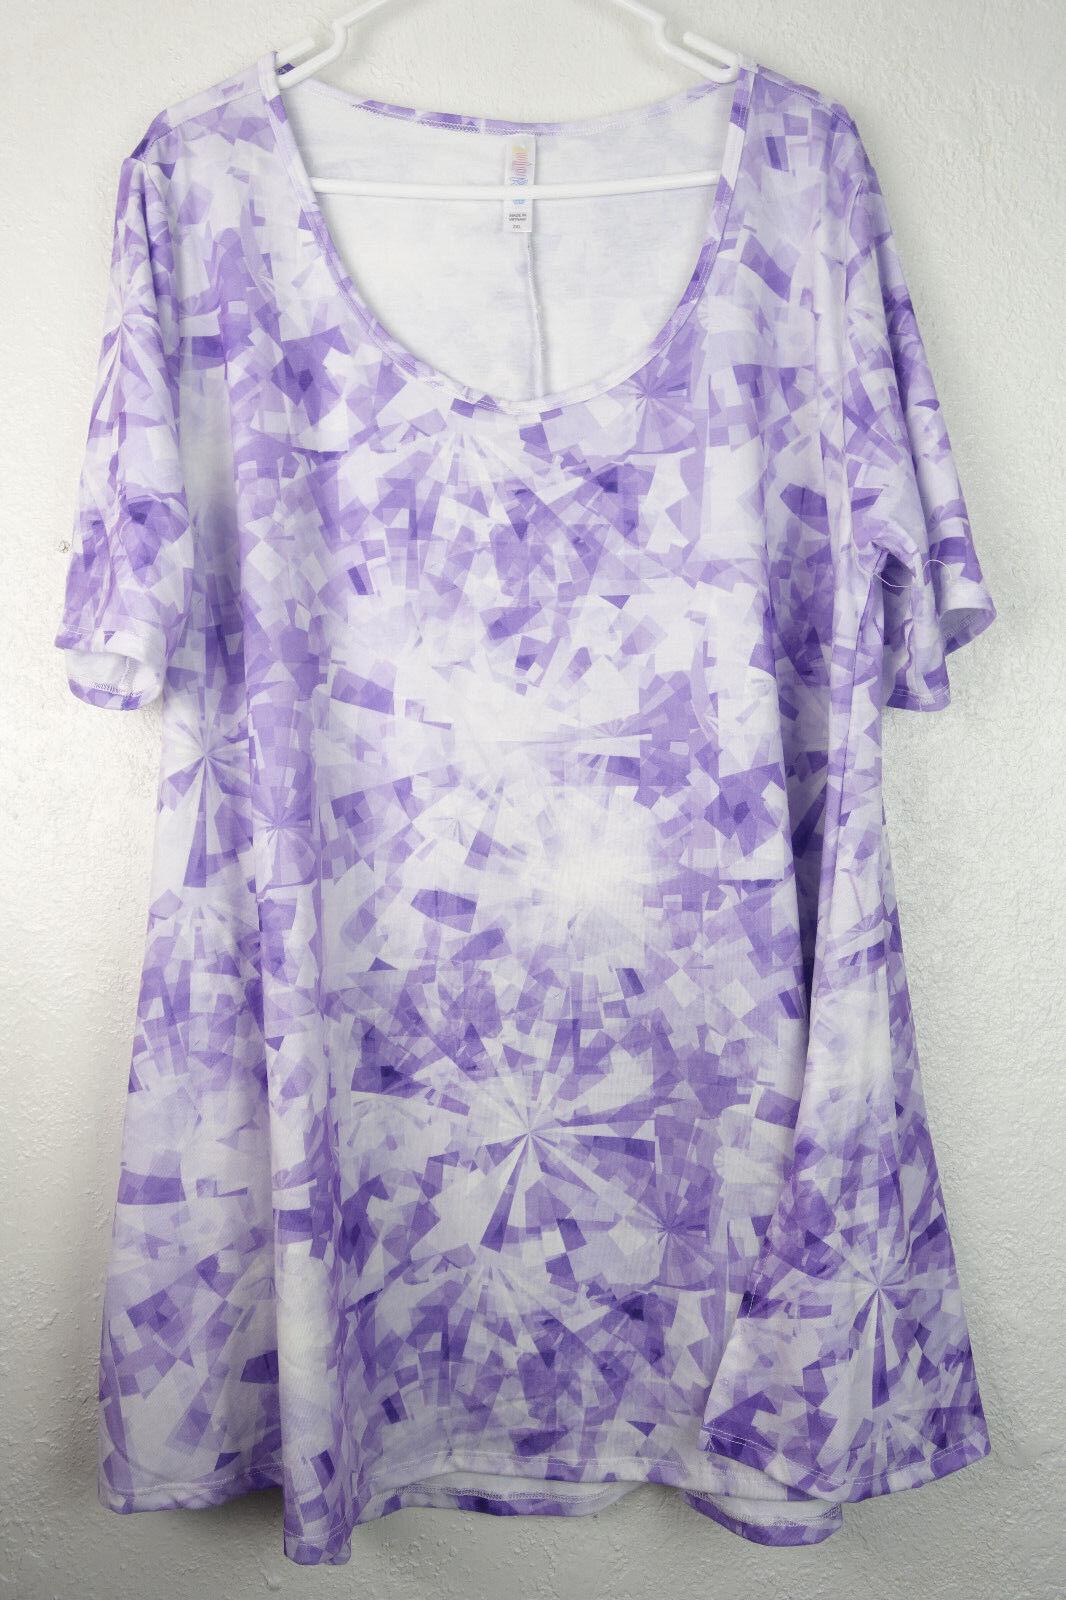 Lularoe Top Shirt Short Sleeve Tunic Flare Purple White Womens Plus 2 2XL